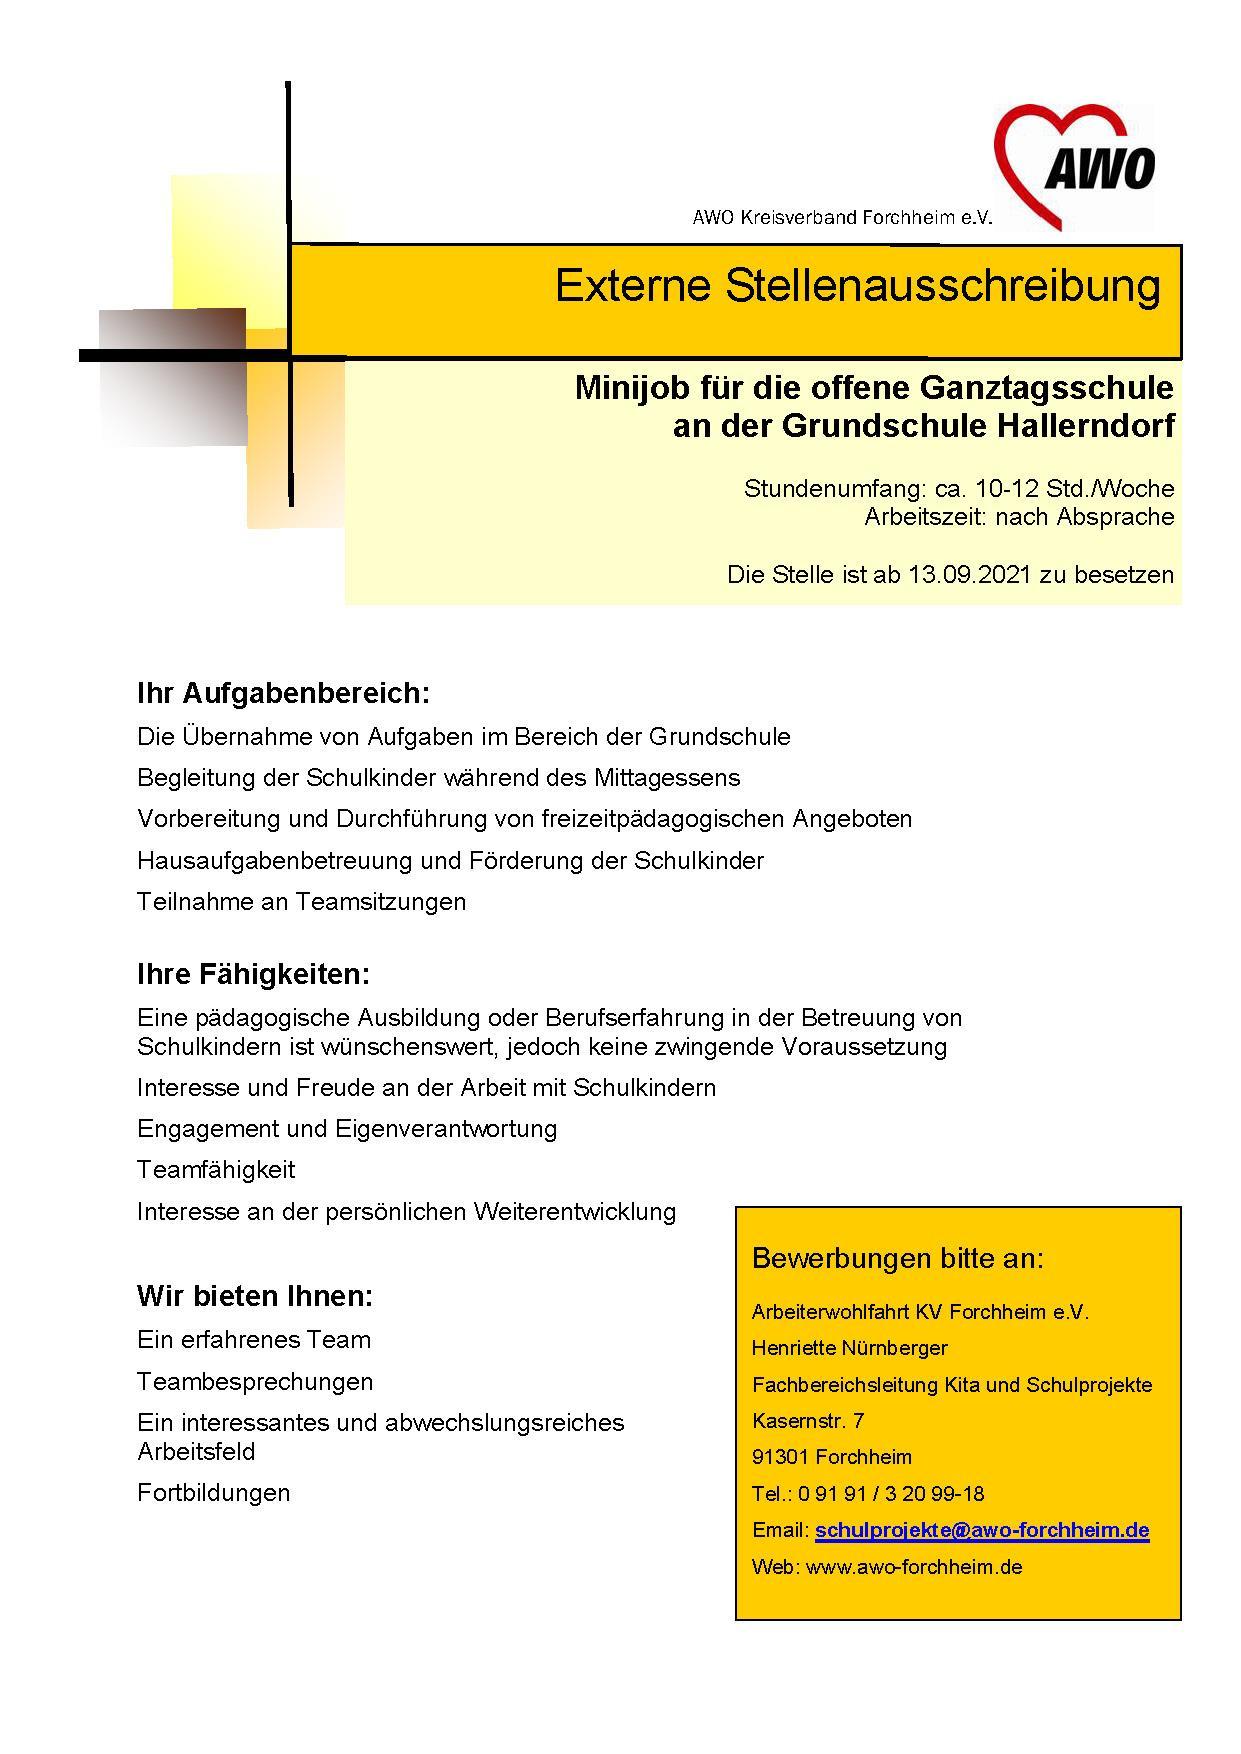 Hallerndorf Minijob ab 9.21